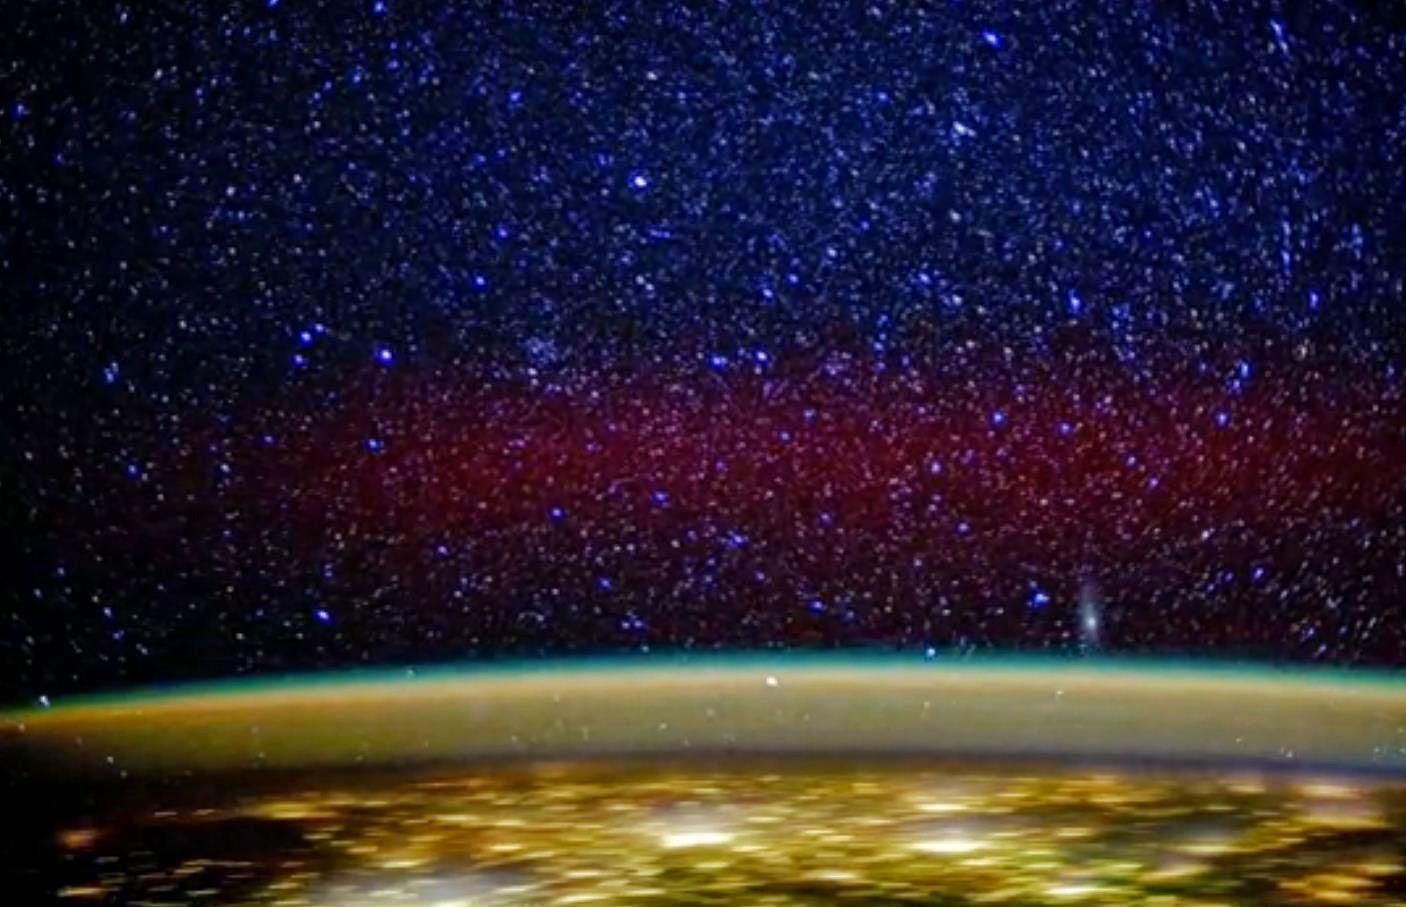 stars_space.jpg